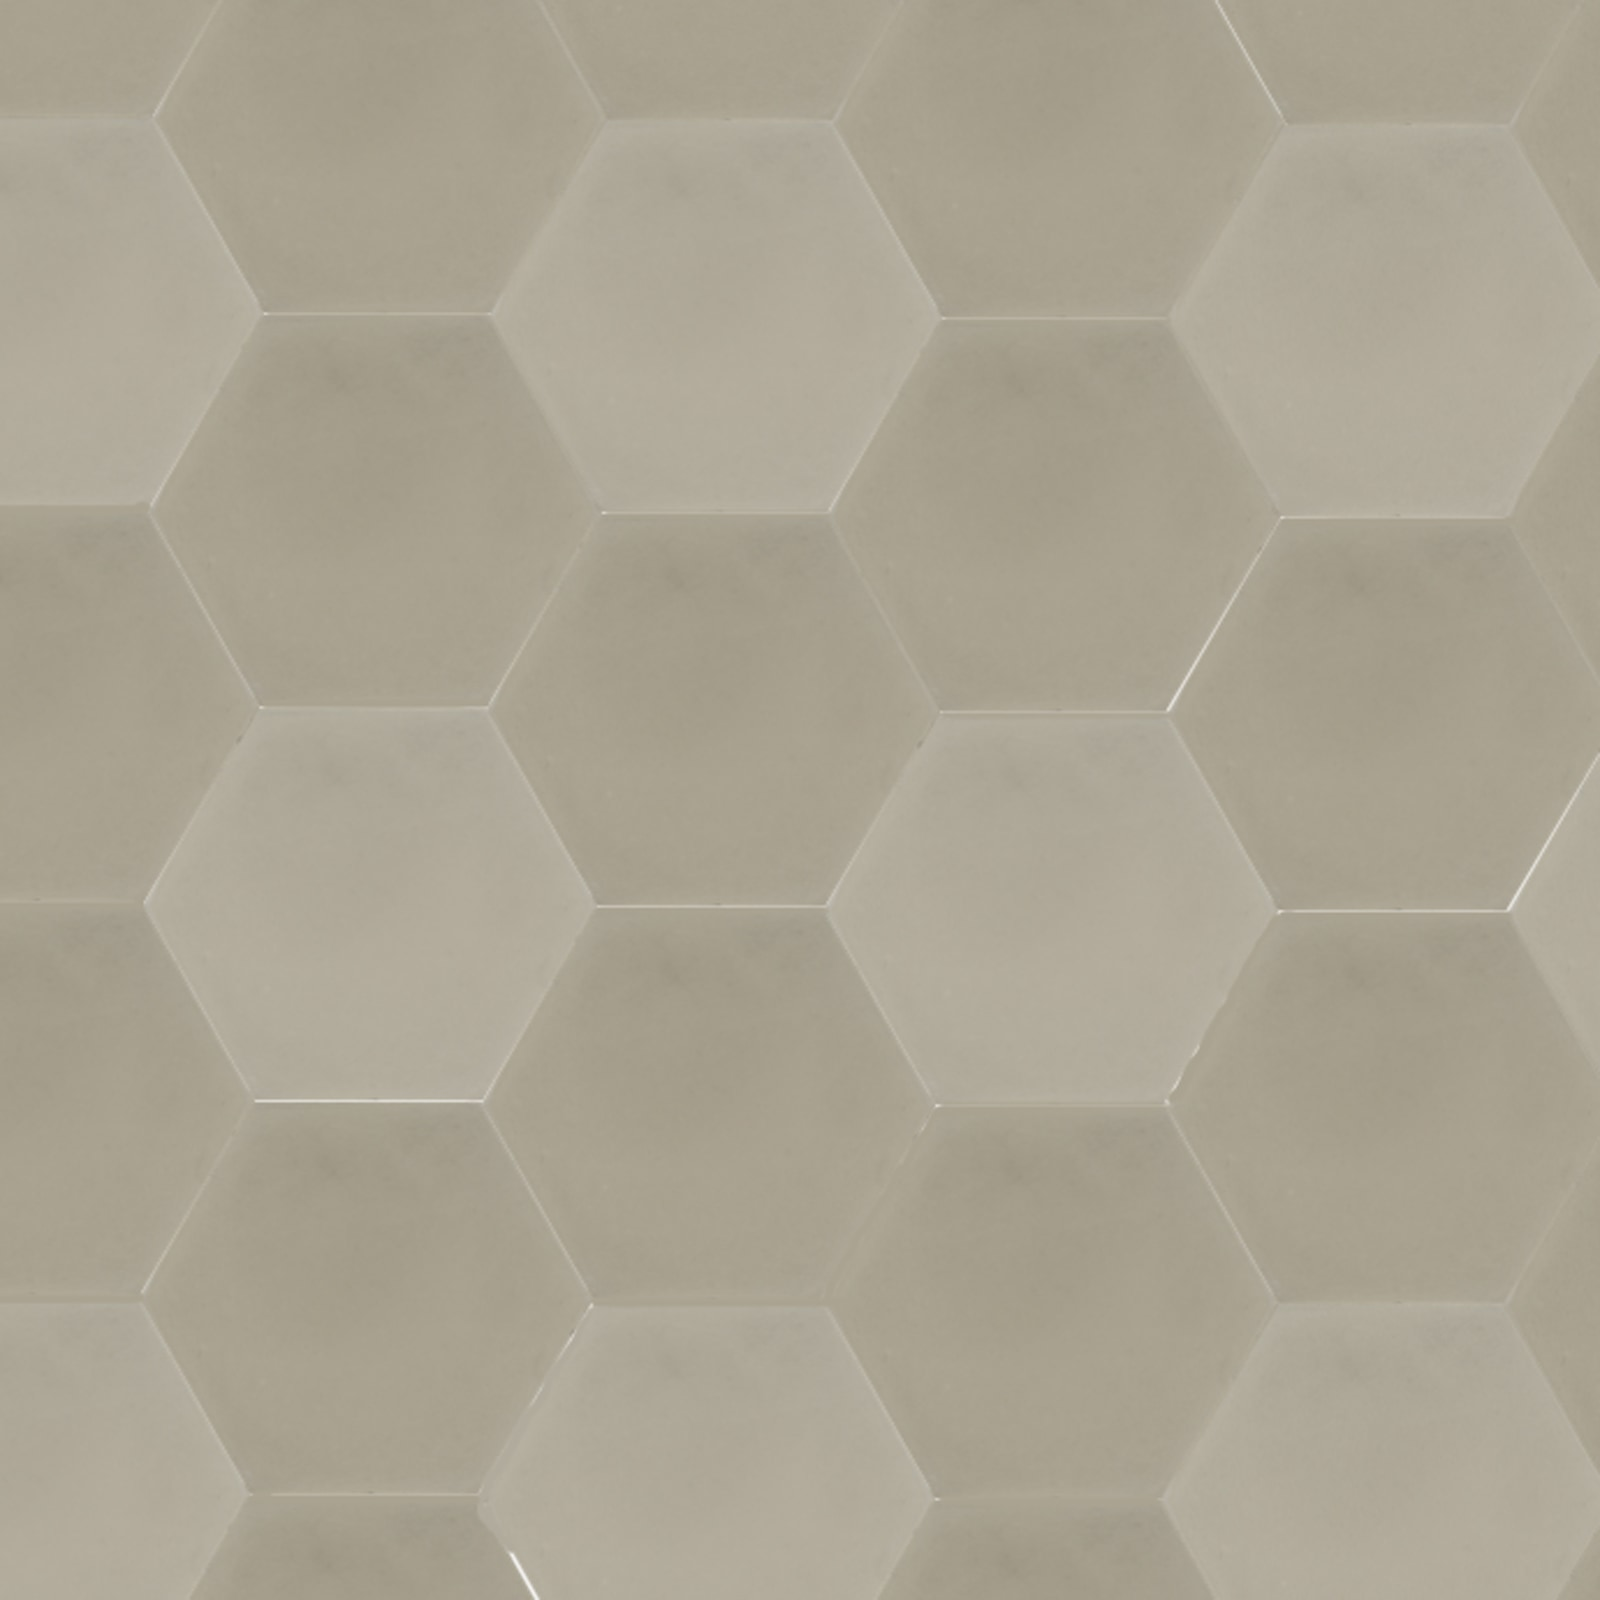 verlegemuster-6-10-via-gmbh-viaplatten | 6-10